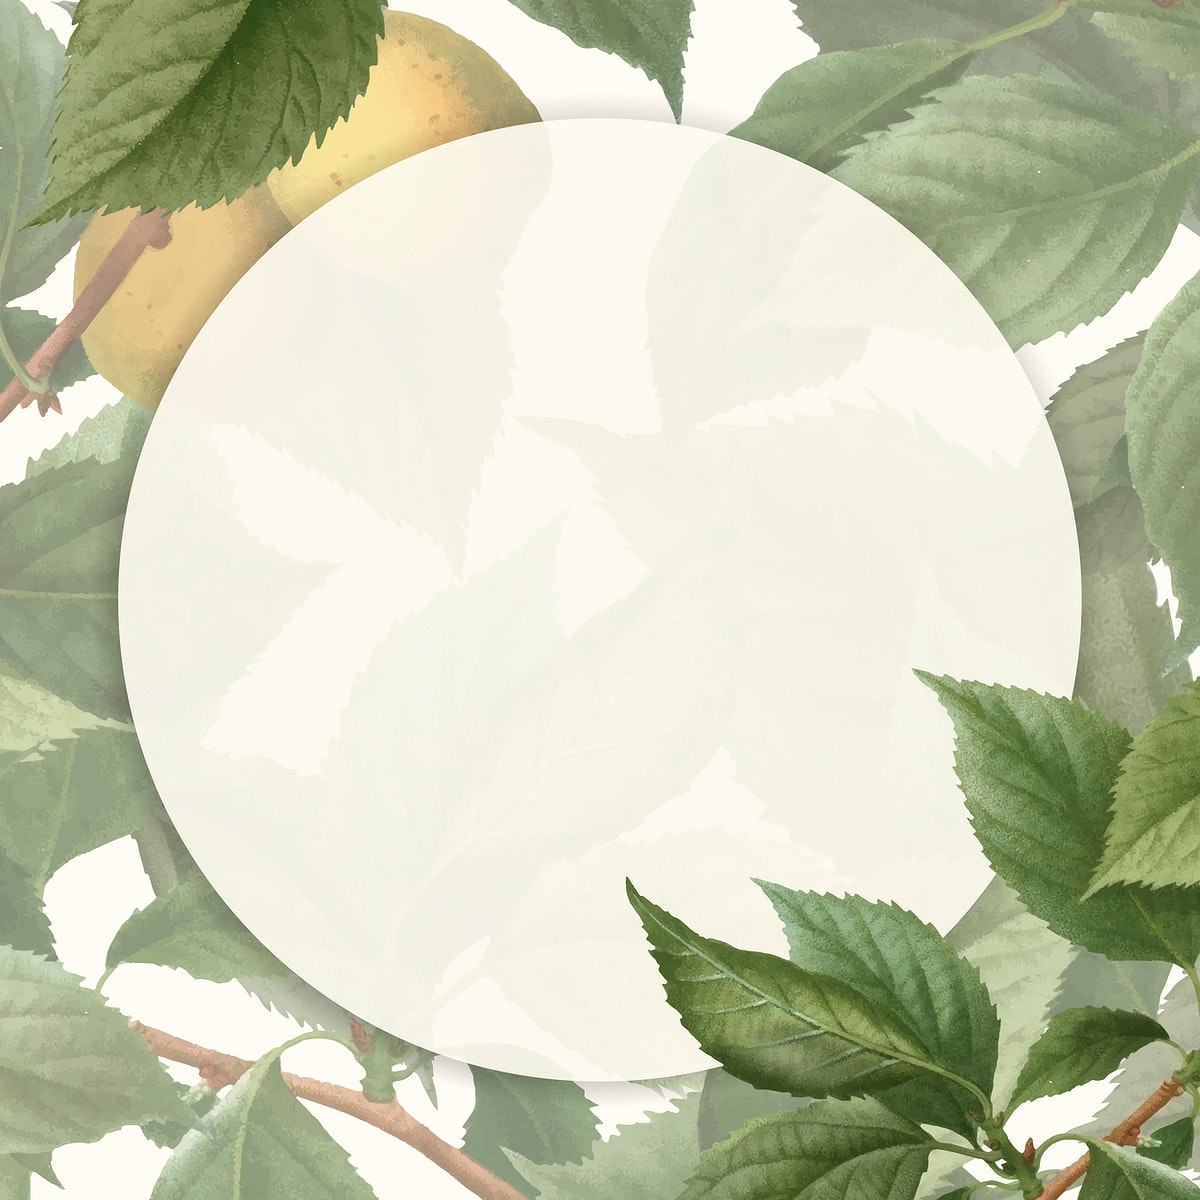 Frame on briançon apricot background vector